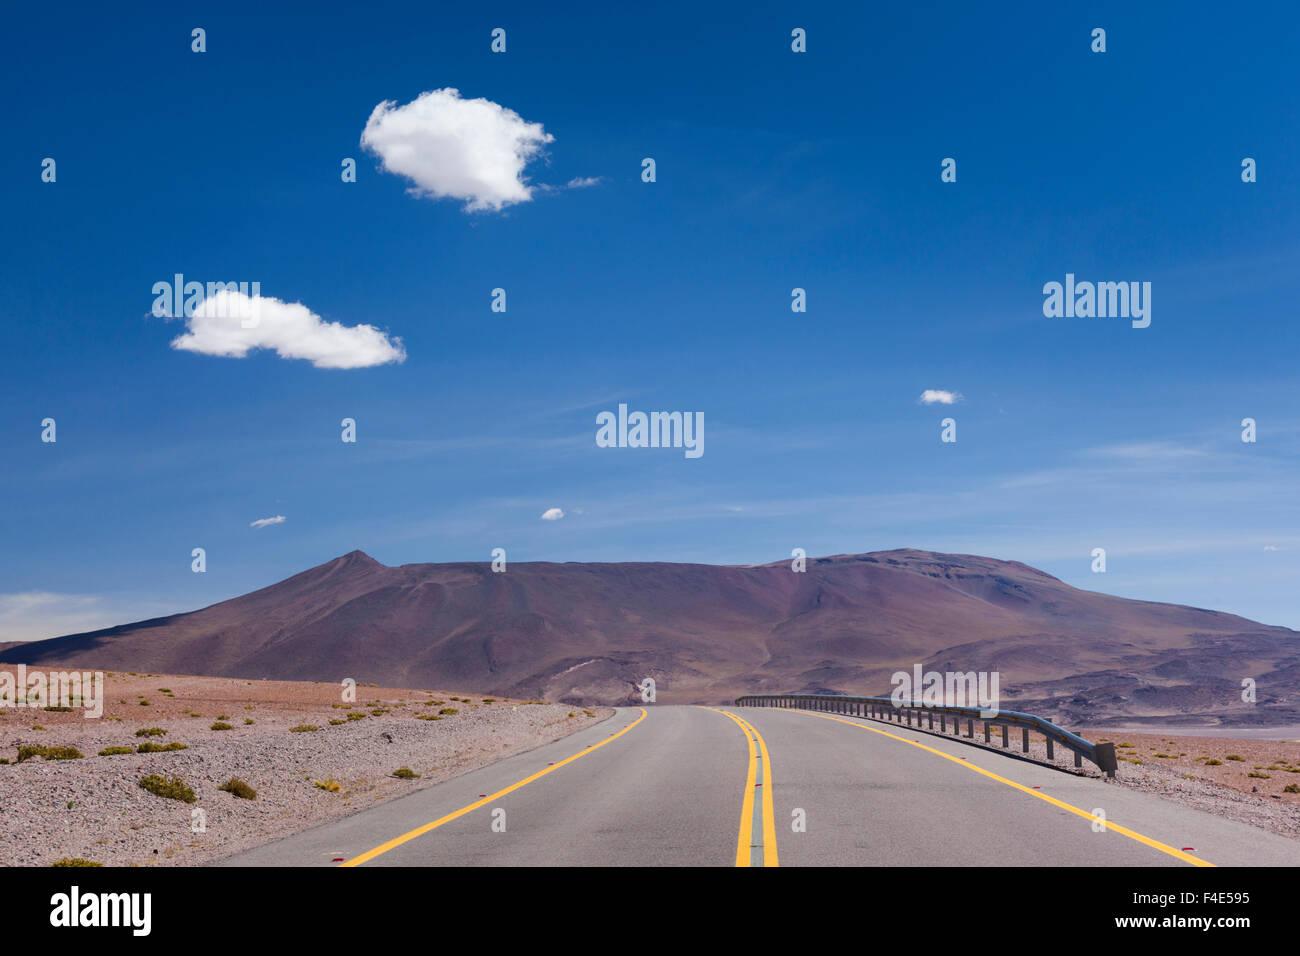 Chile, Atacama Desert, Ruta 27 CH highway. - Stock Image